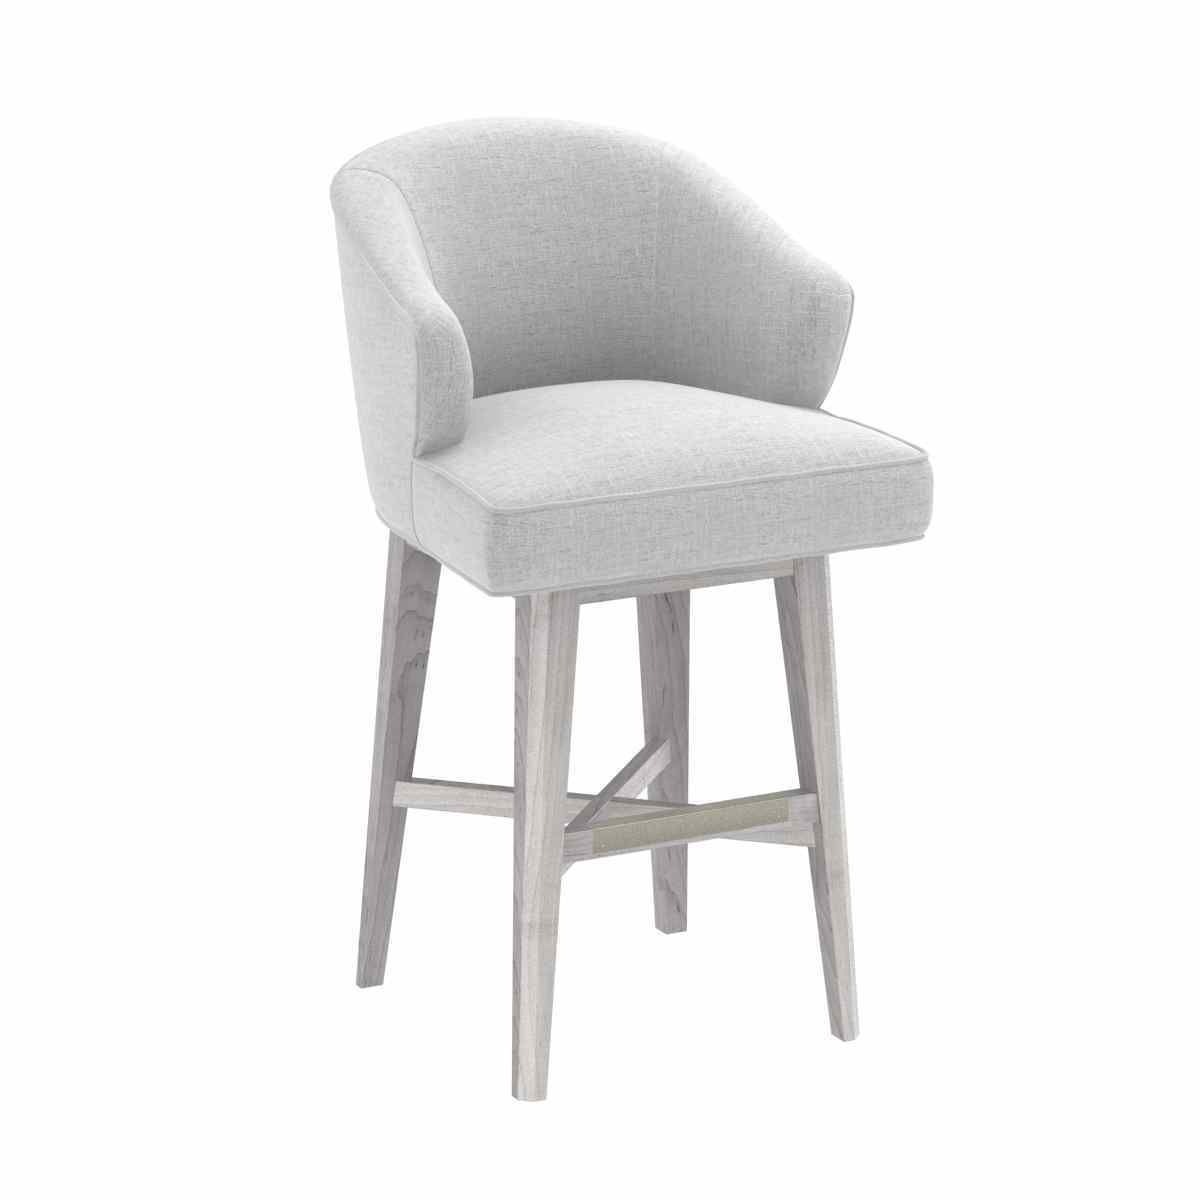 Peachy Vanguard Charley Barstool 3D Model 3D Model Alphanode Cool Chair Designs And Ideas Alphanodeonline